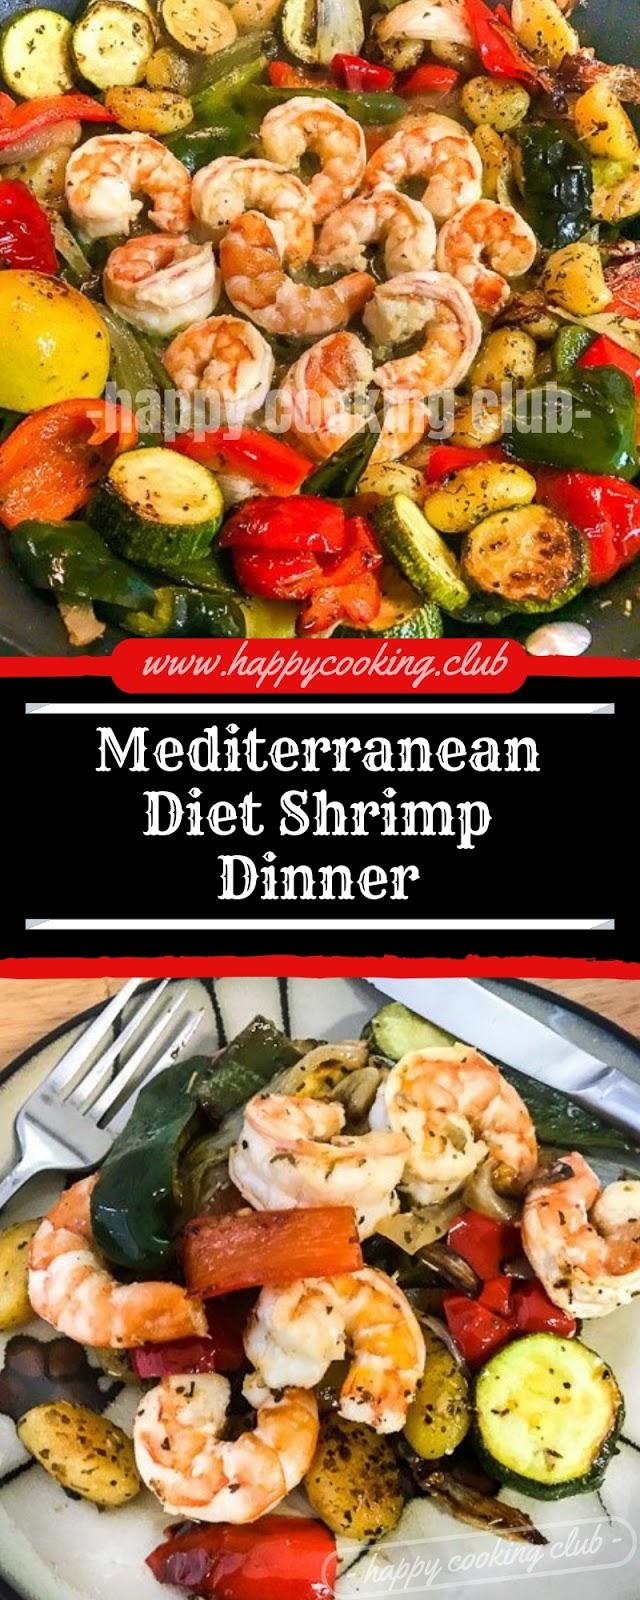 Mediterranean Diet Shrimp Dinner